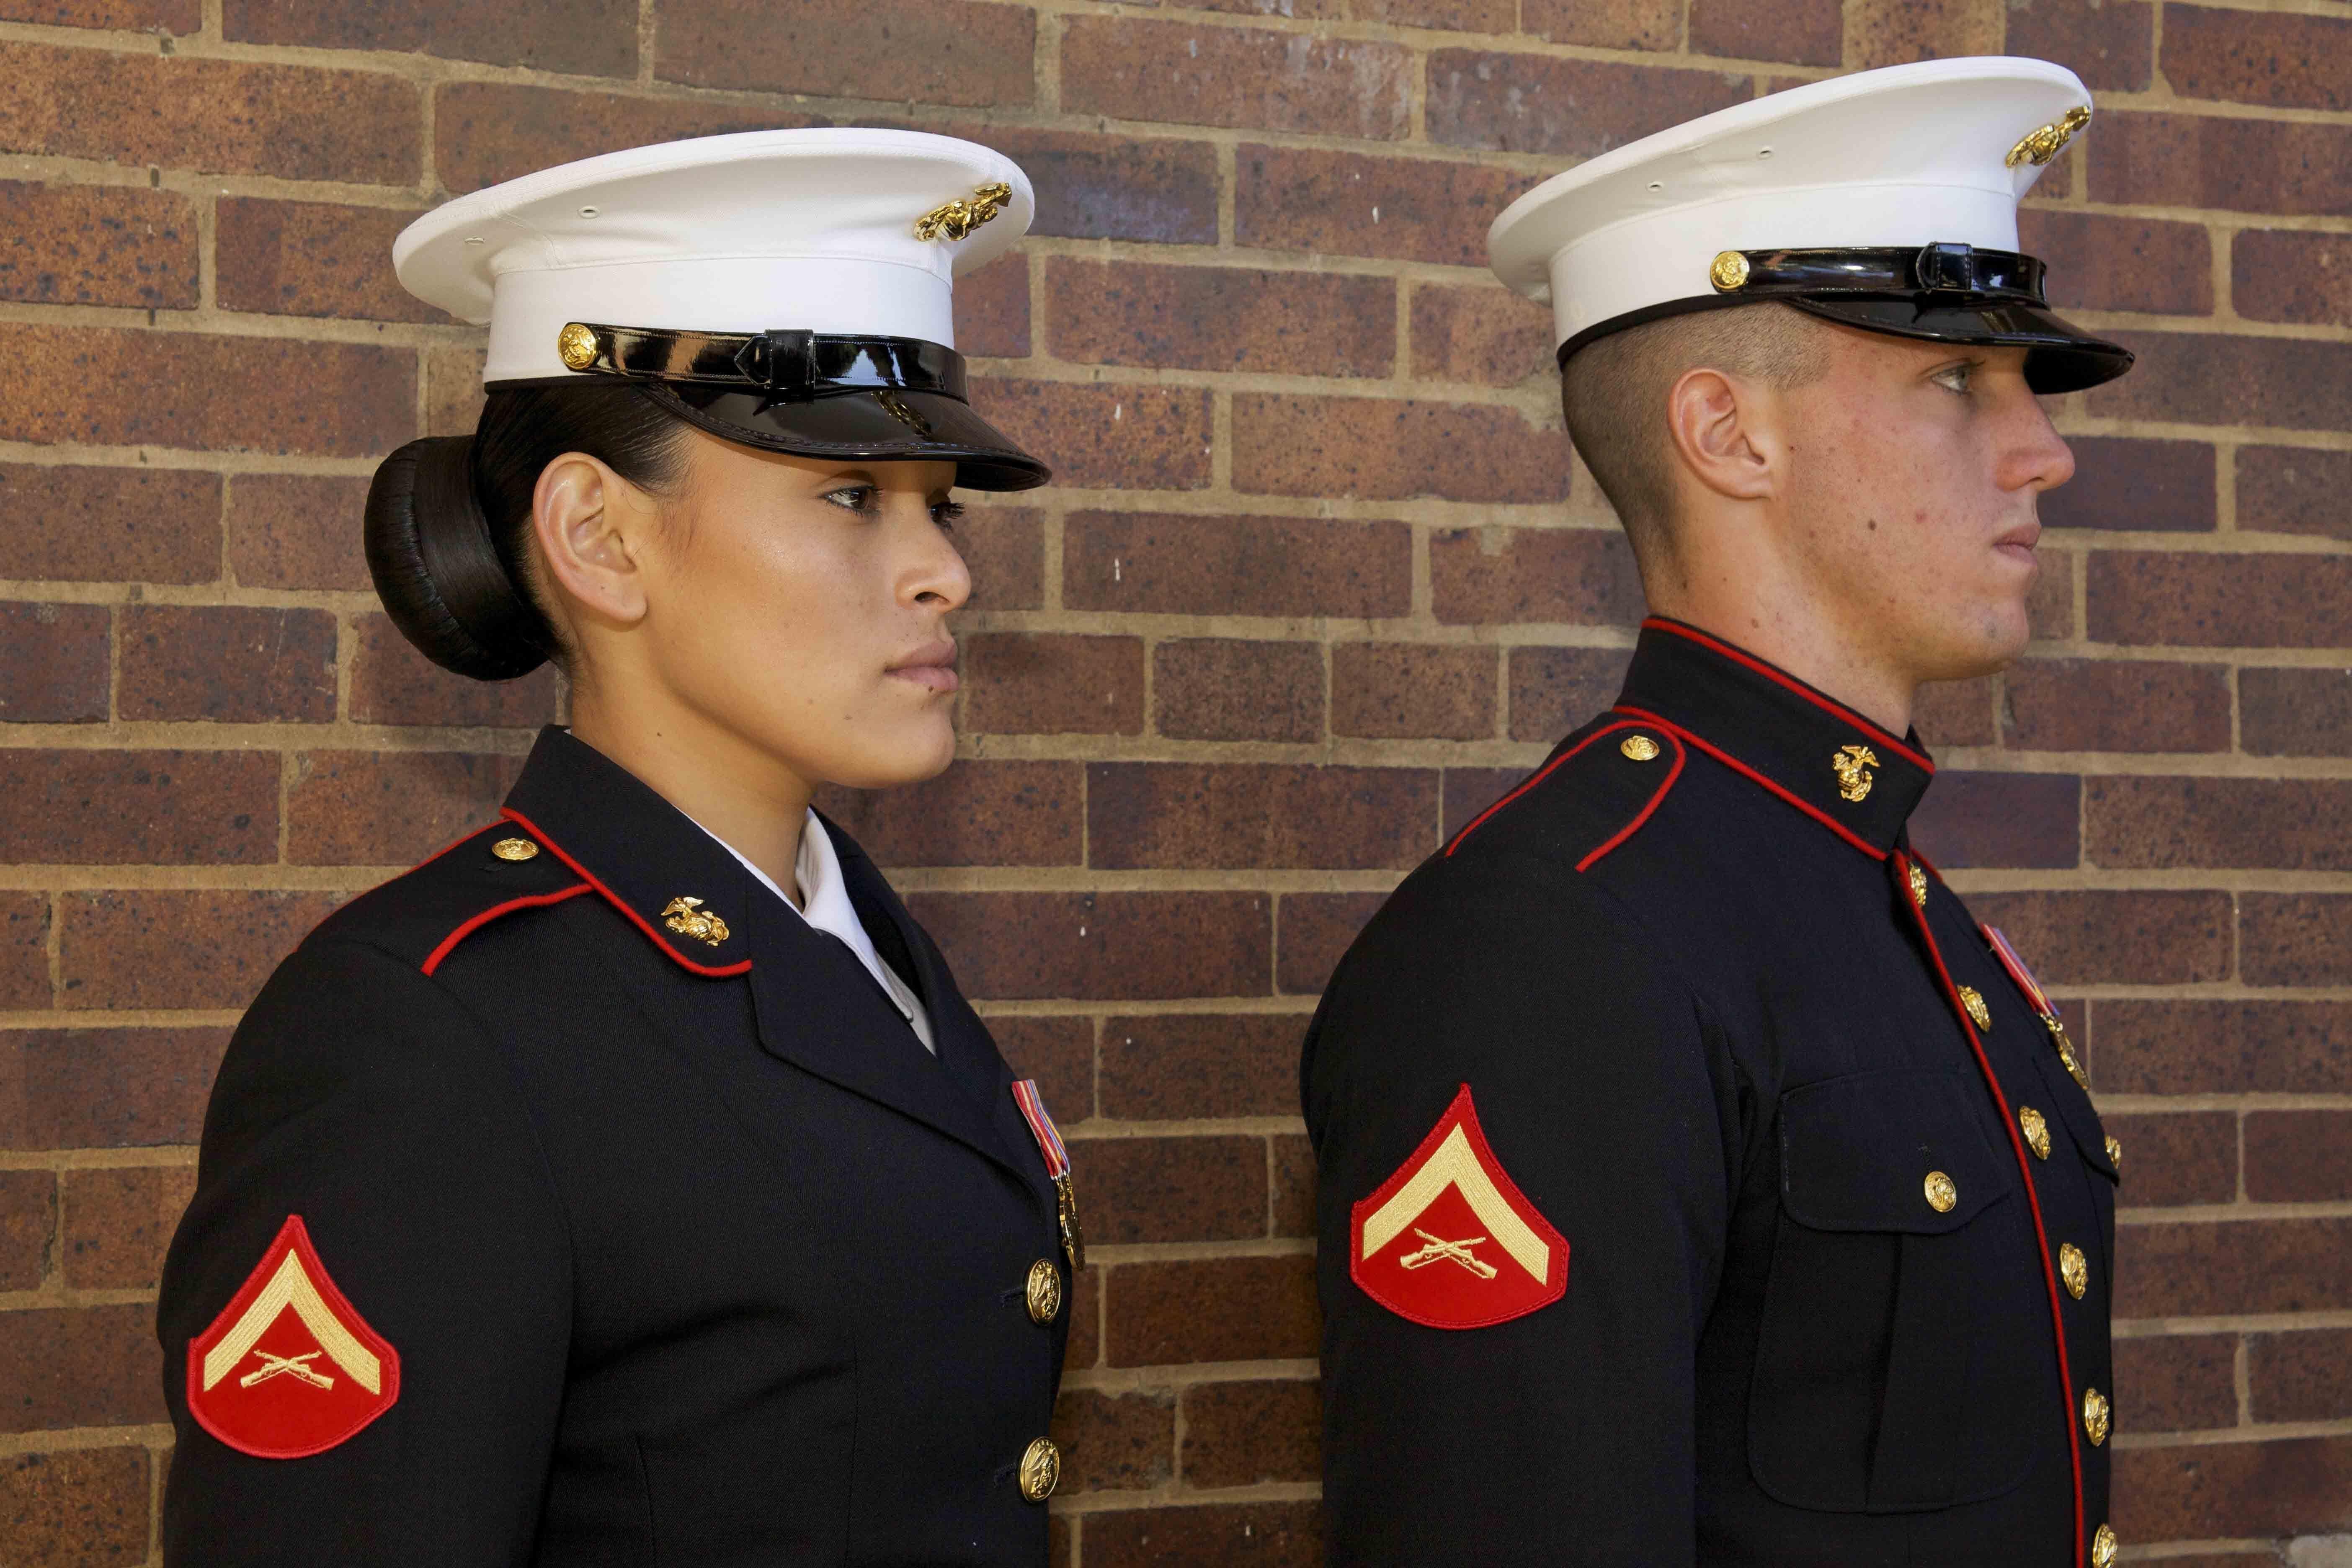 Evening dress marine corps